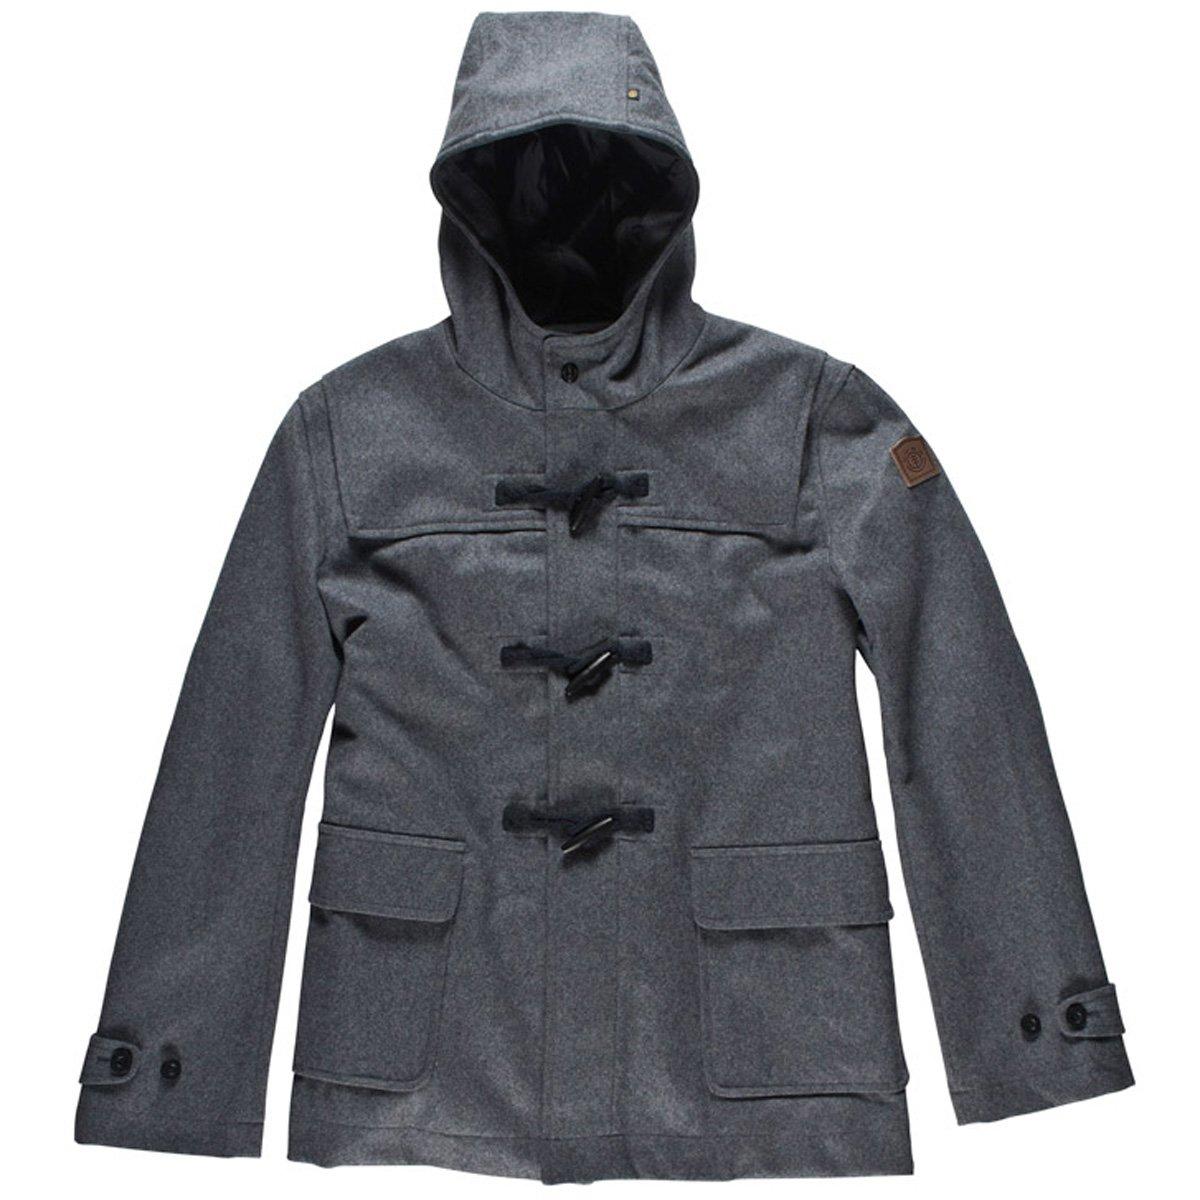 Herren Jacke Element Hufton Jacket online kaufen